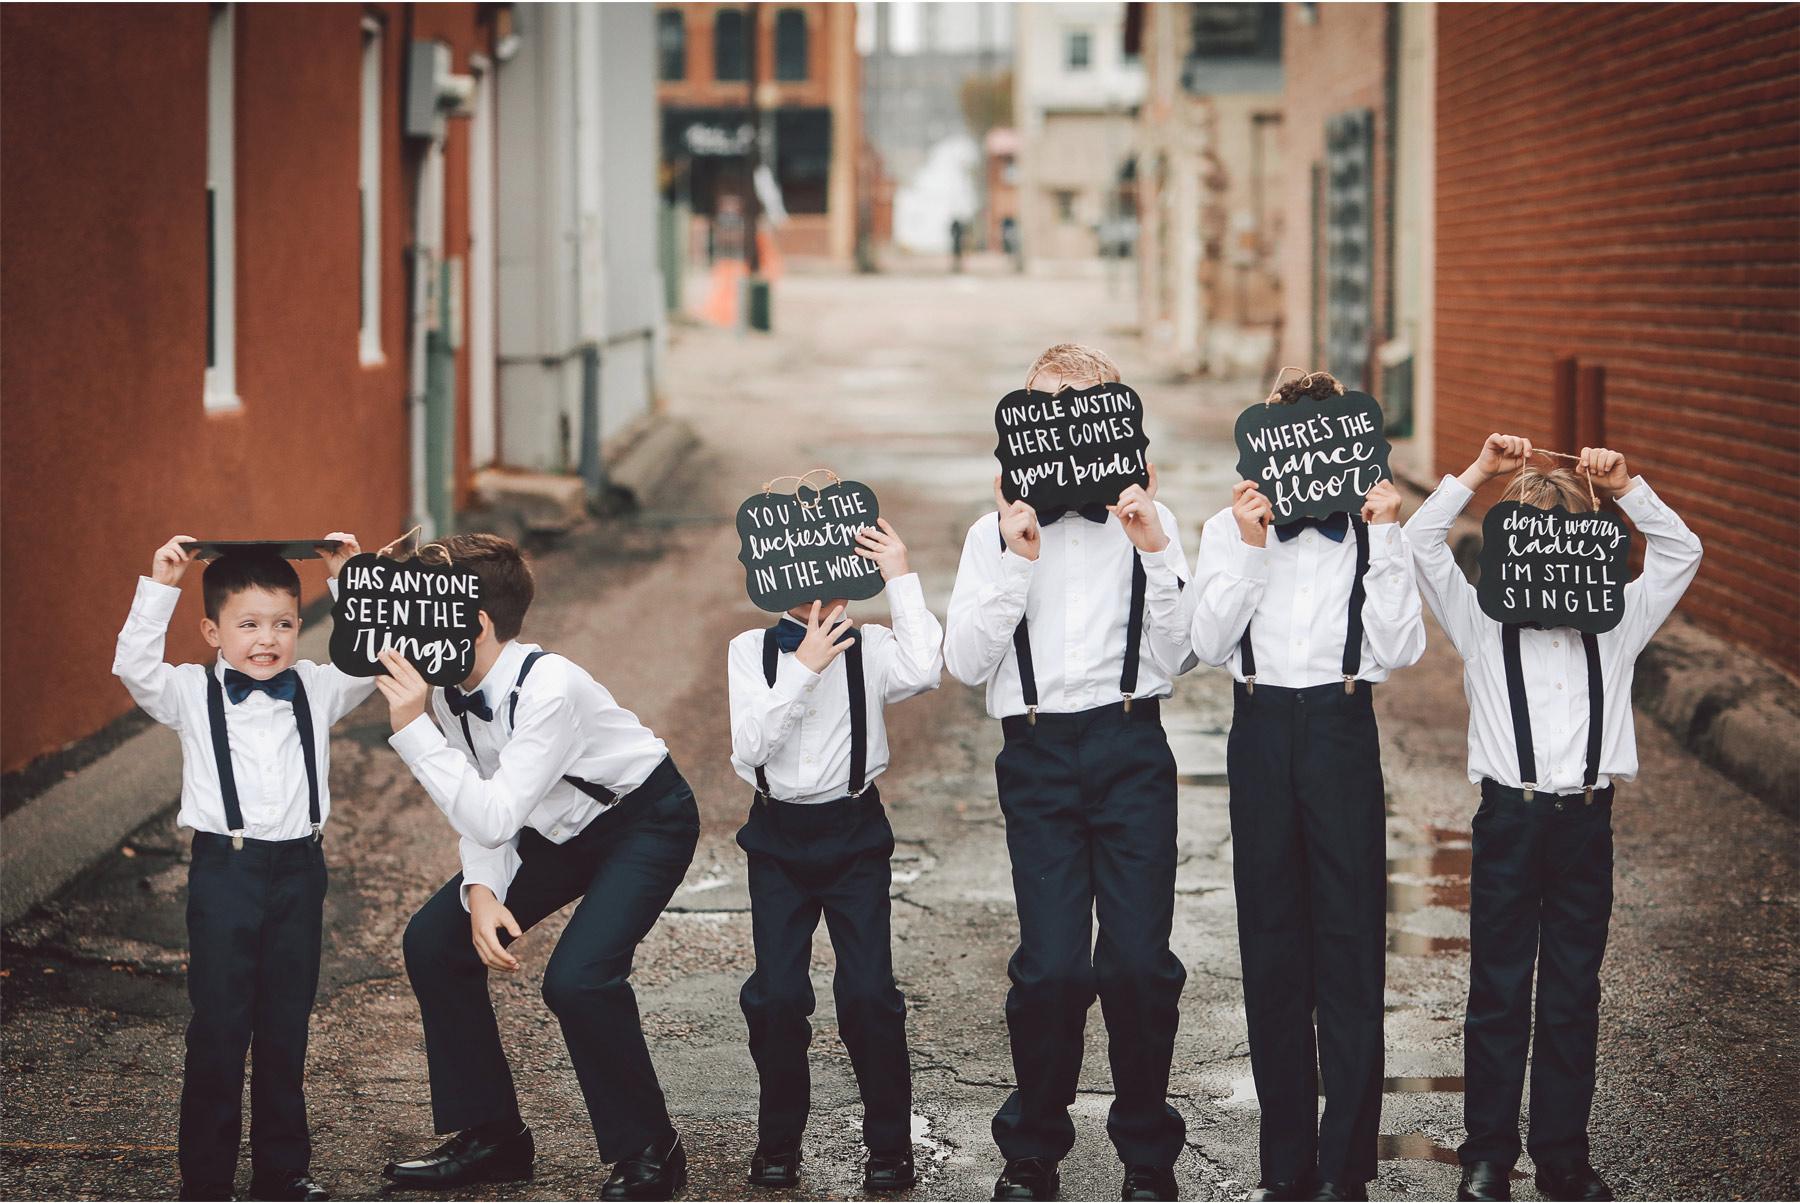 15-Shakopee-Minnesota-Wedding-Photography-by-Vick-Photography-Wedding-Signs-Ring-Bearers-Amber-and-Justin.jpg